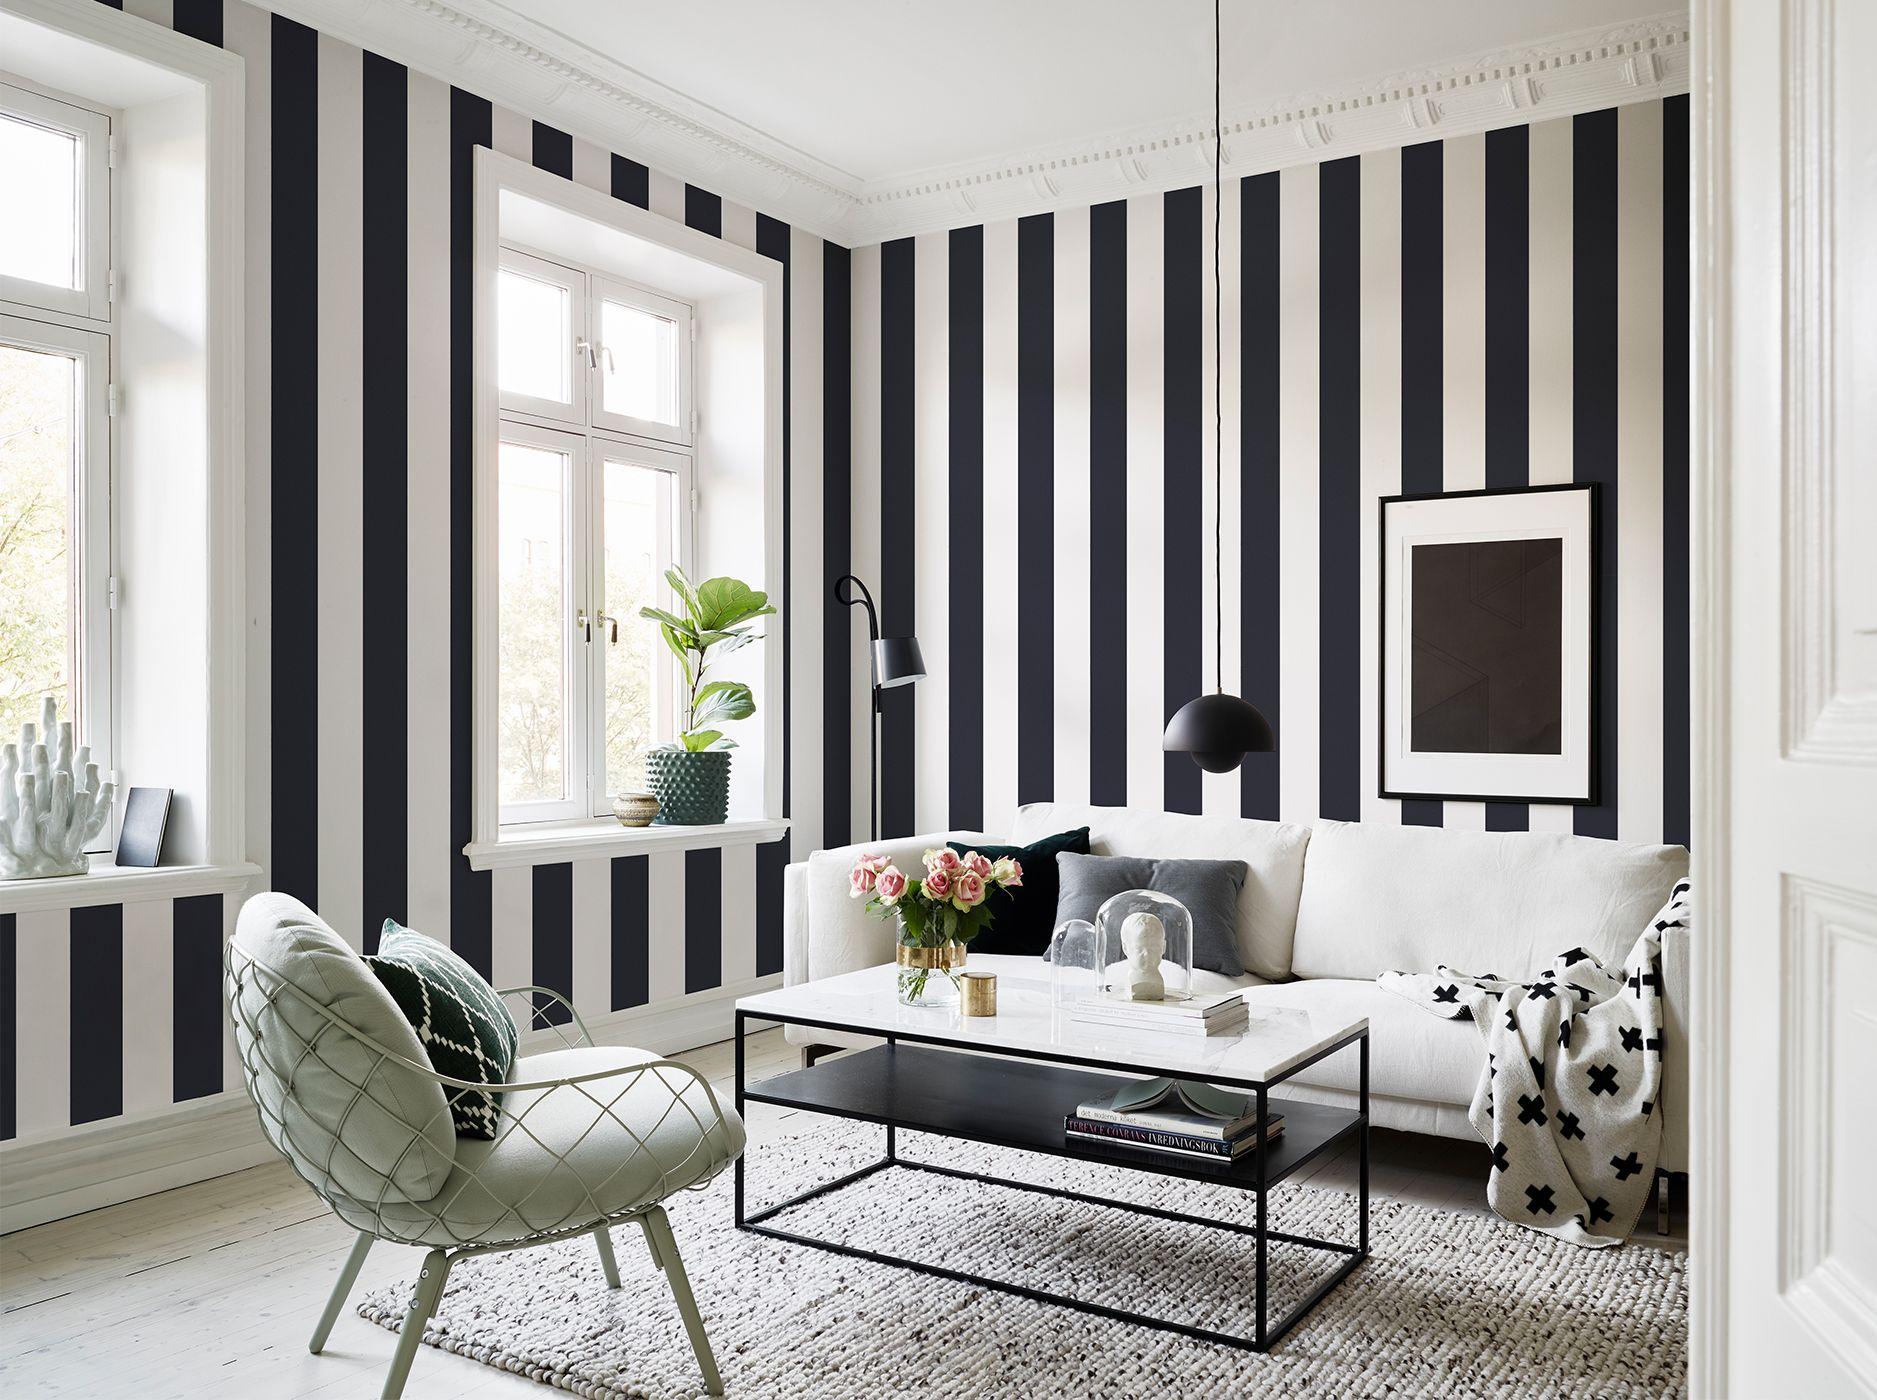 10 Striped Wallpaper Design Ideas Bright Bazaar By Will Ta